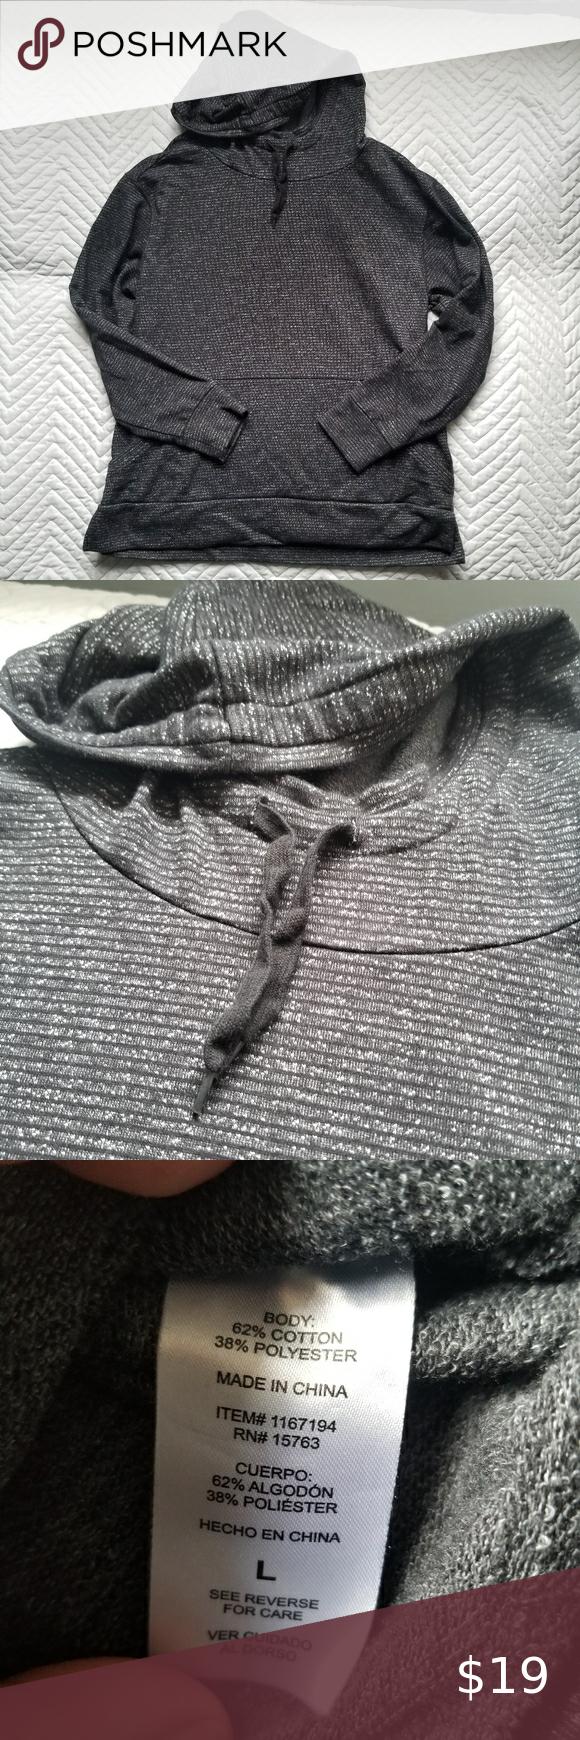 Champion Elite Light Hoodie Large Grey Comfy Hoodies Used Clothing Champion Tops [ 1740 x 580 Pixel ]